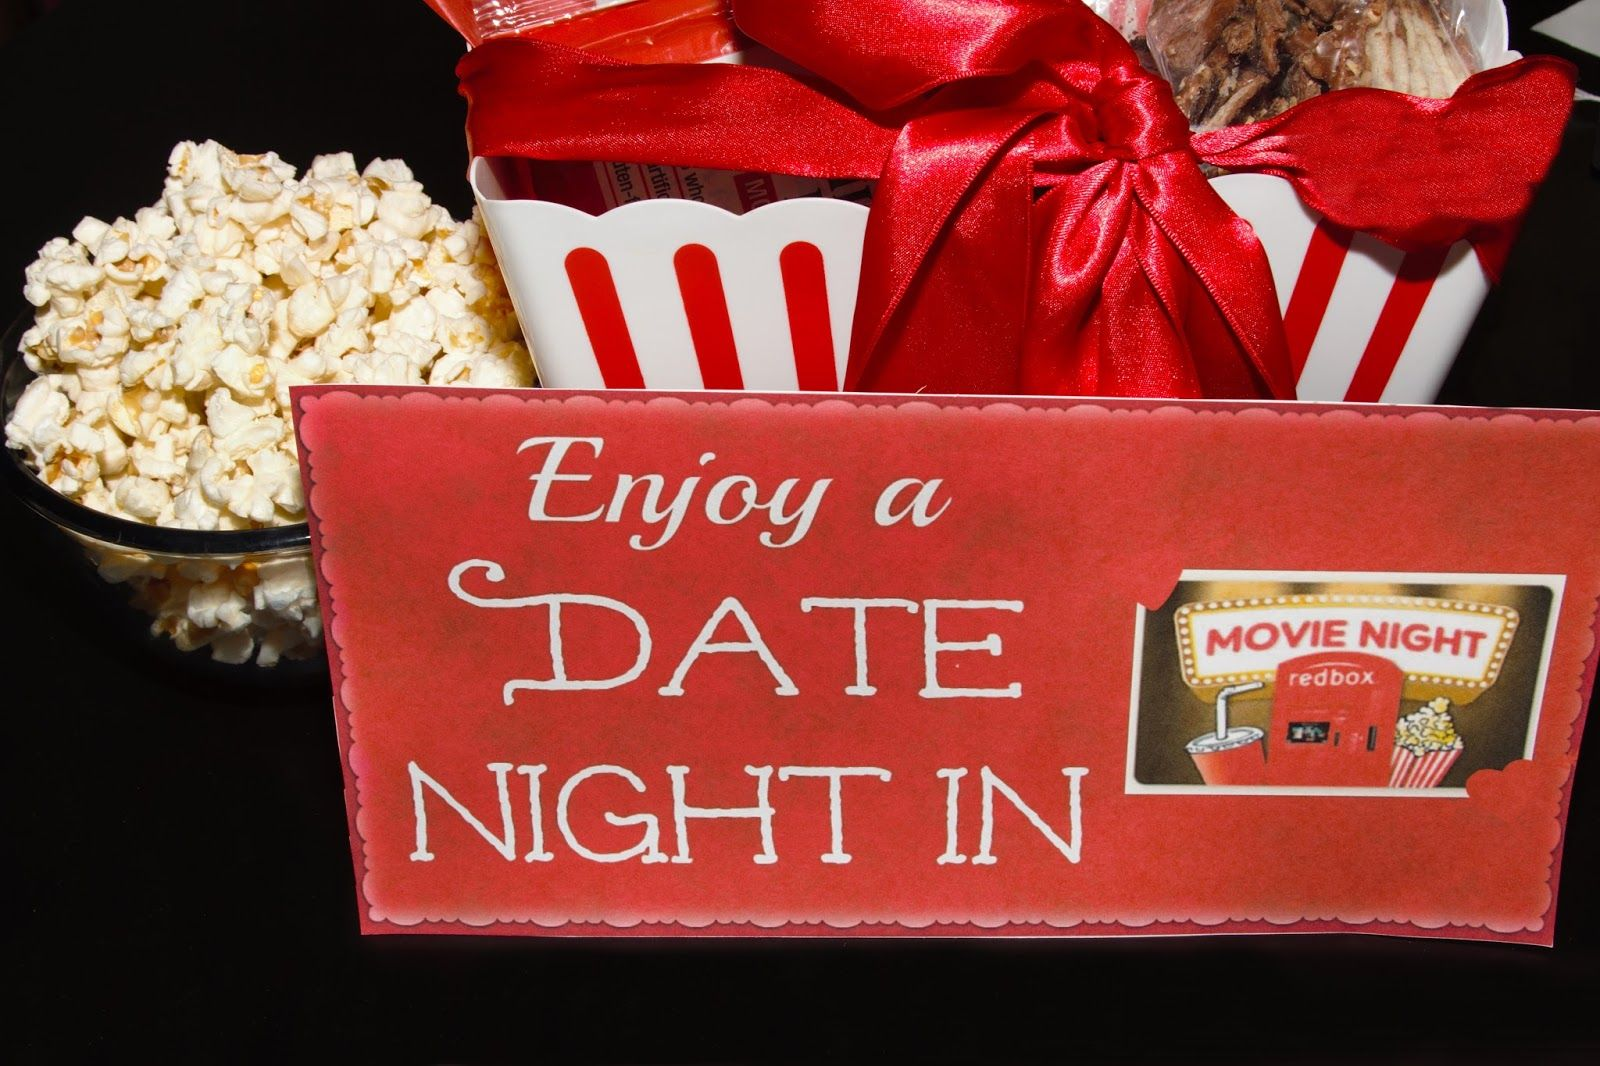 Diy date night in gift basket with redbox movie night